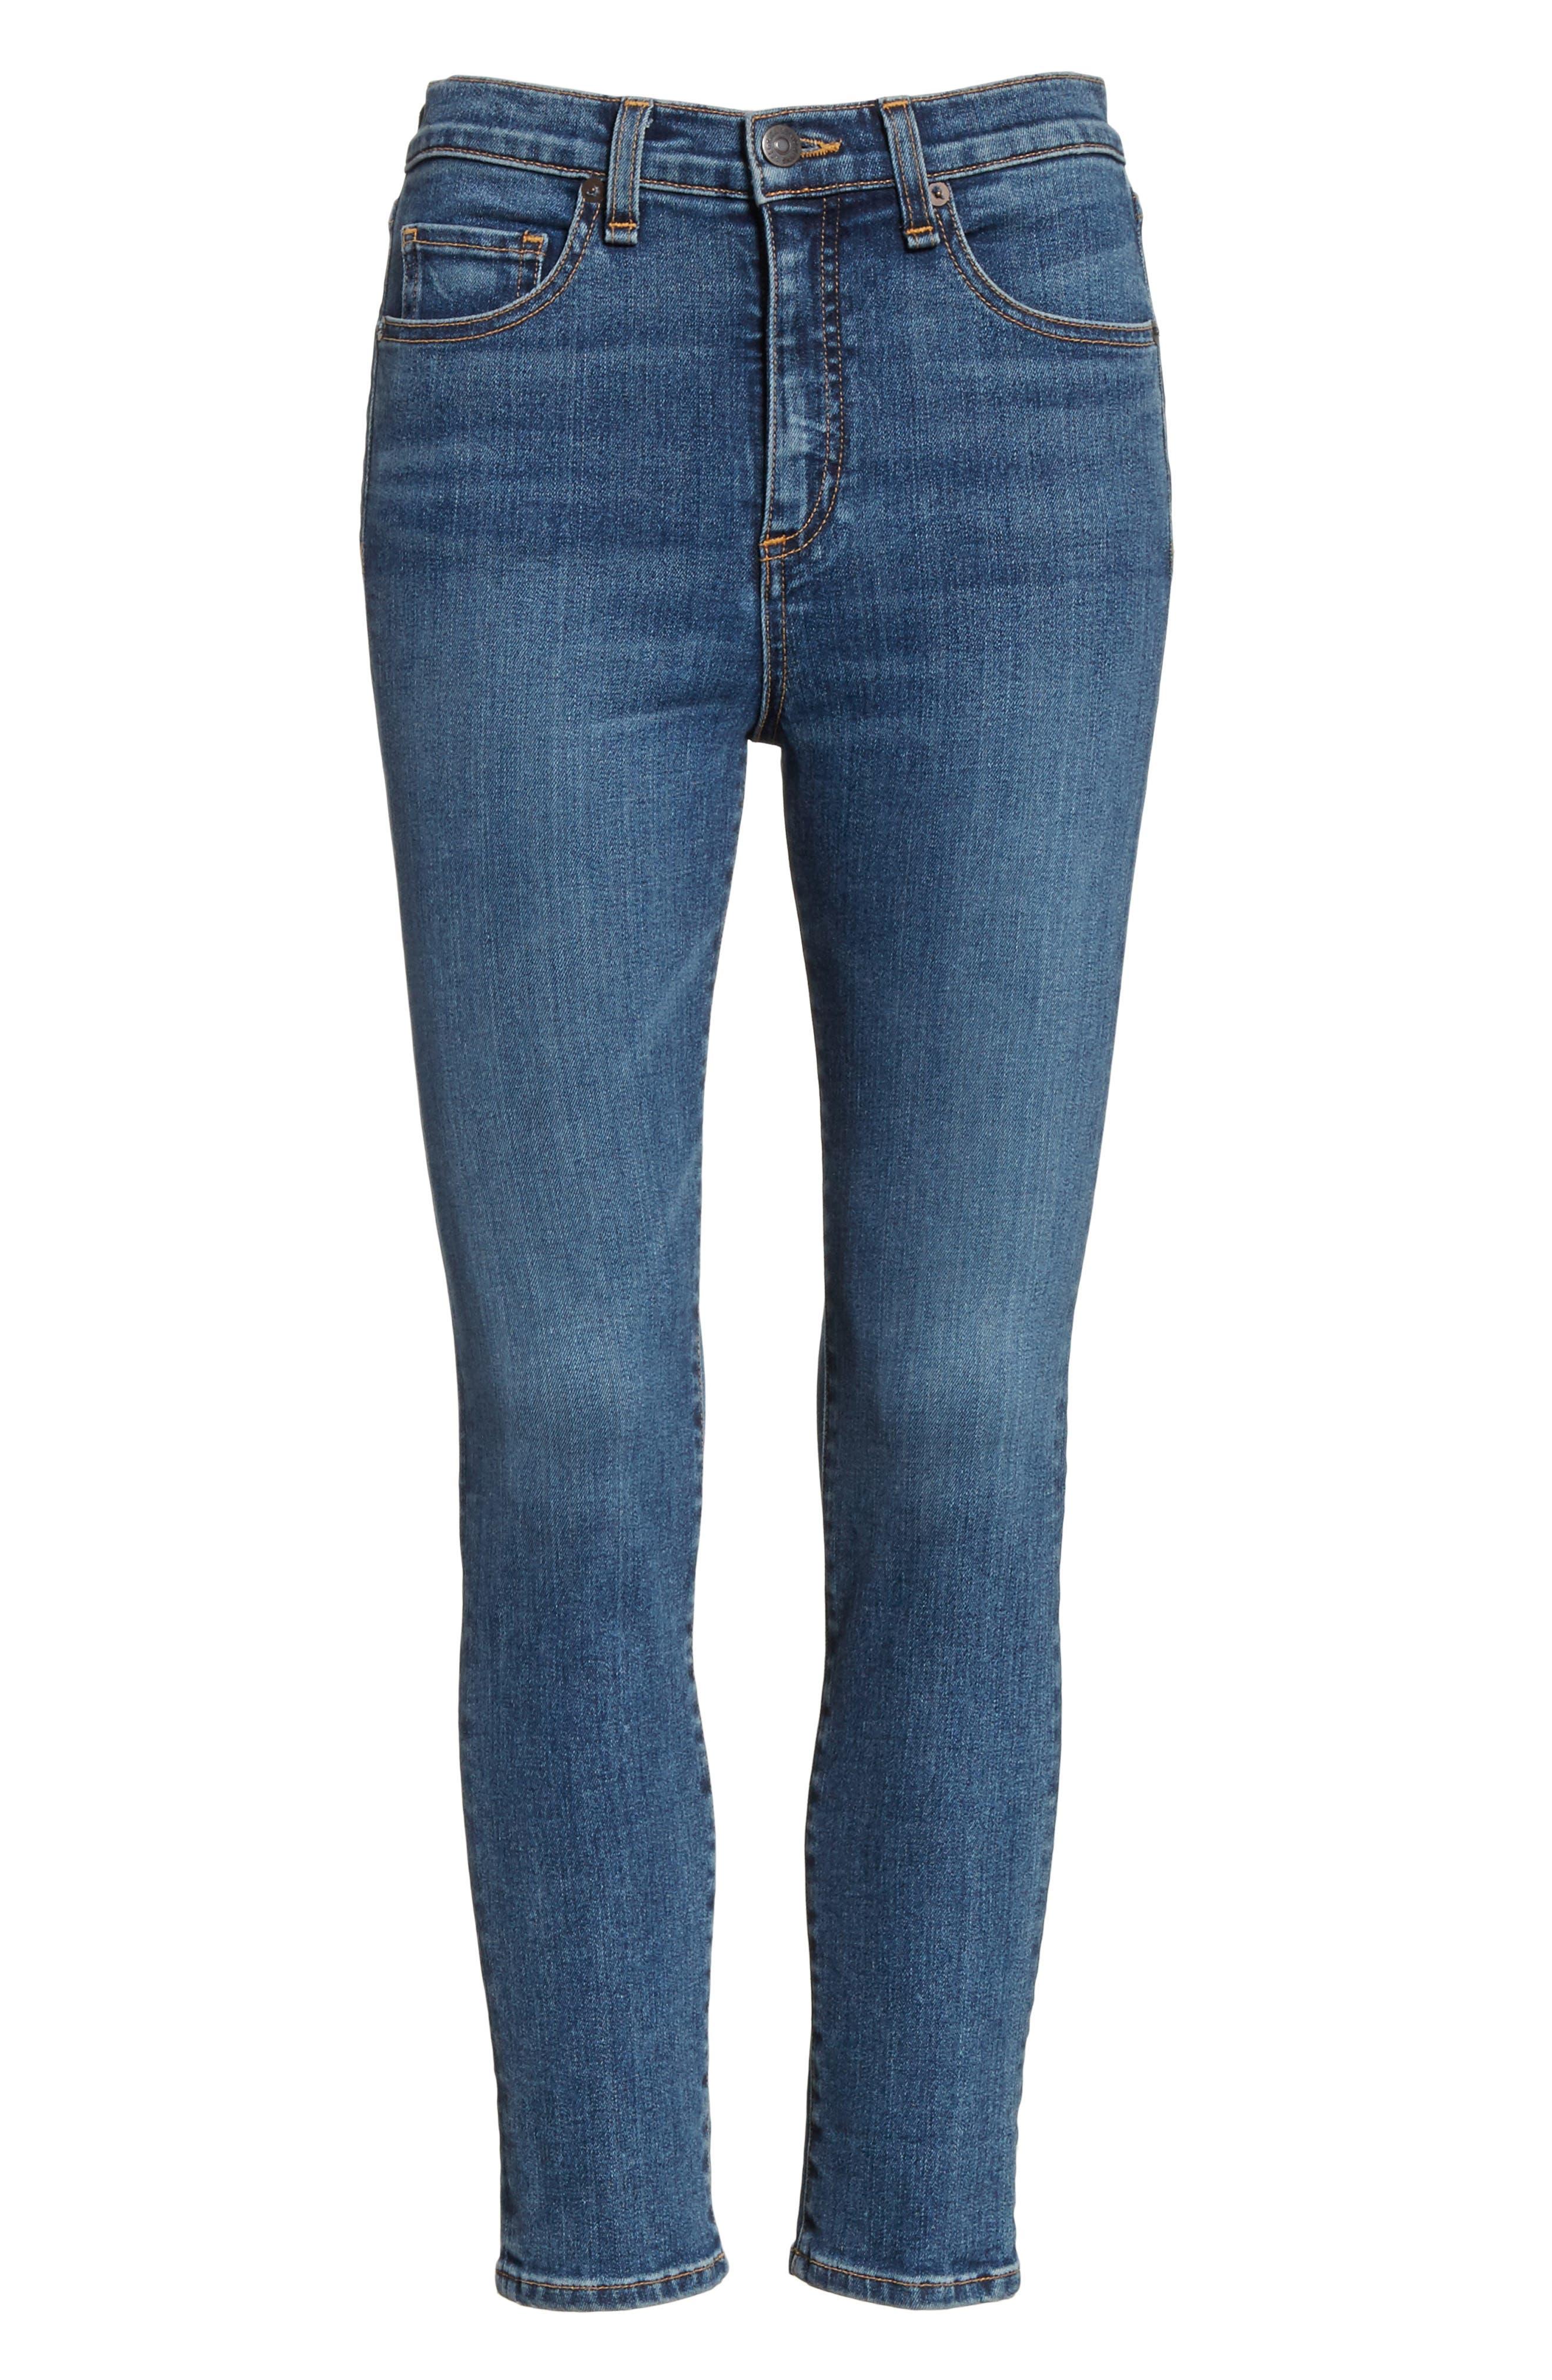 Kate Crop Skinny Jeans,                             Alternate thumbnail 6, color,                             400